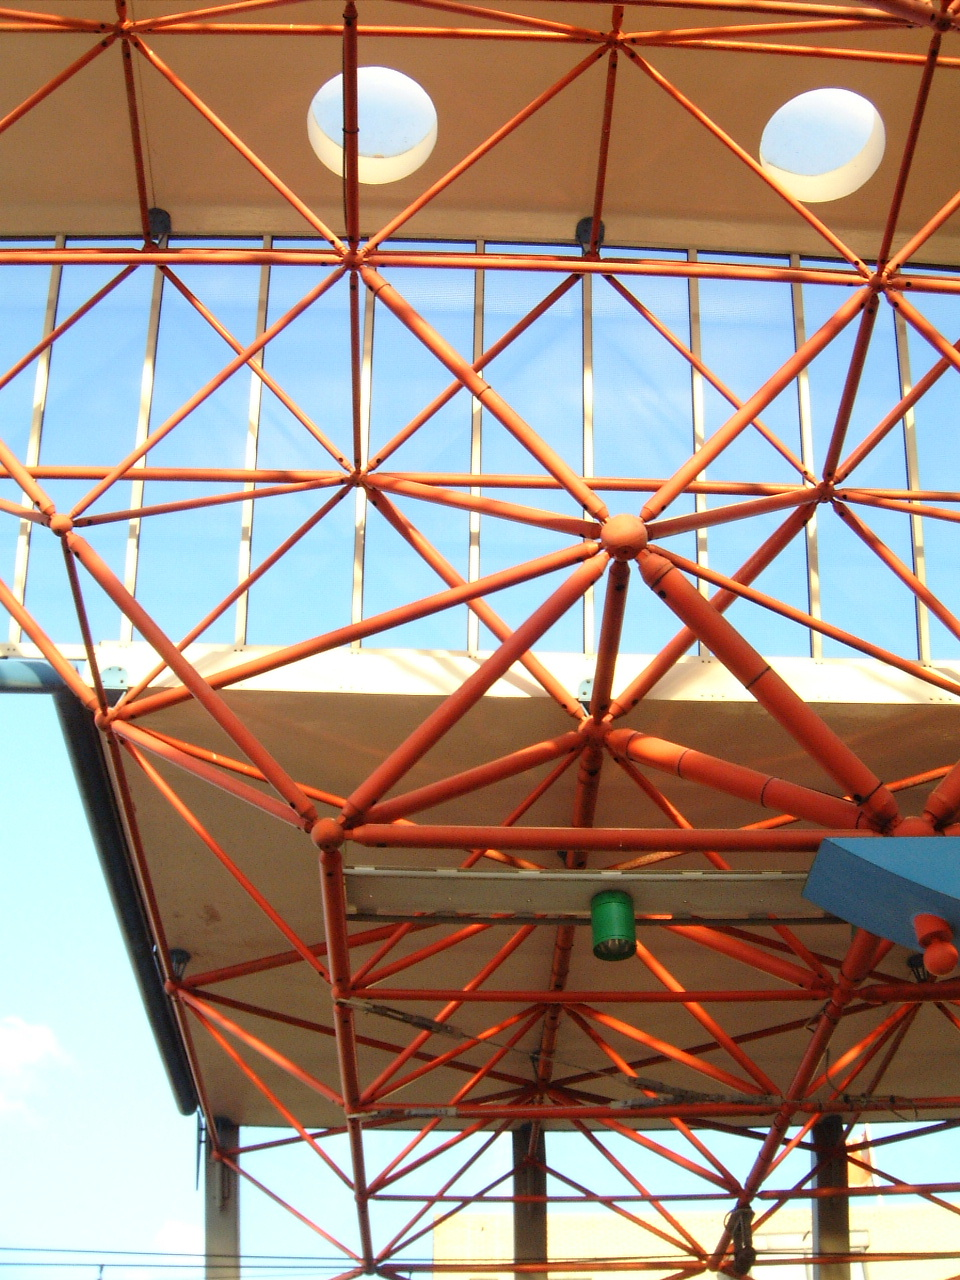 maartent platform pipes building modern design roof